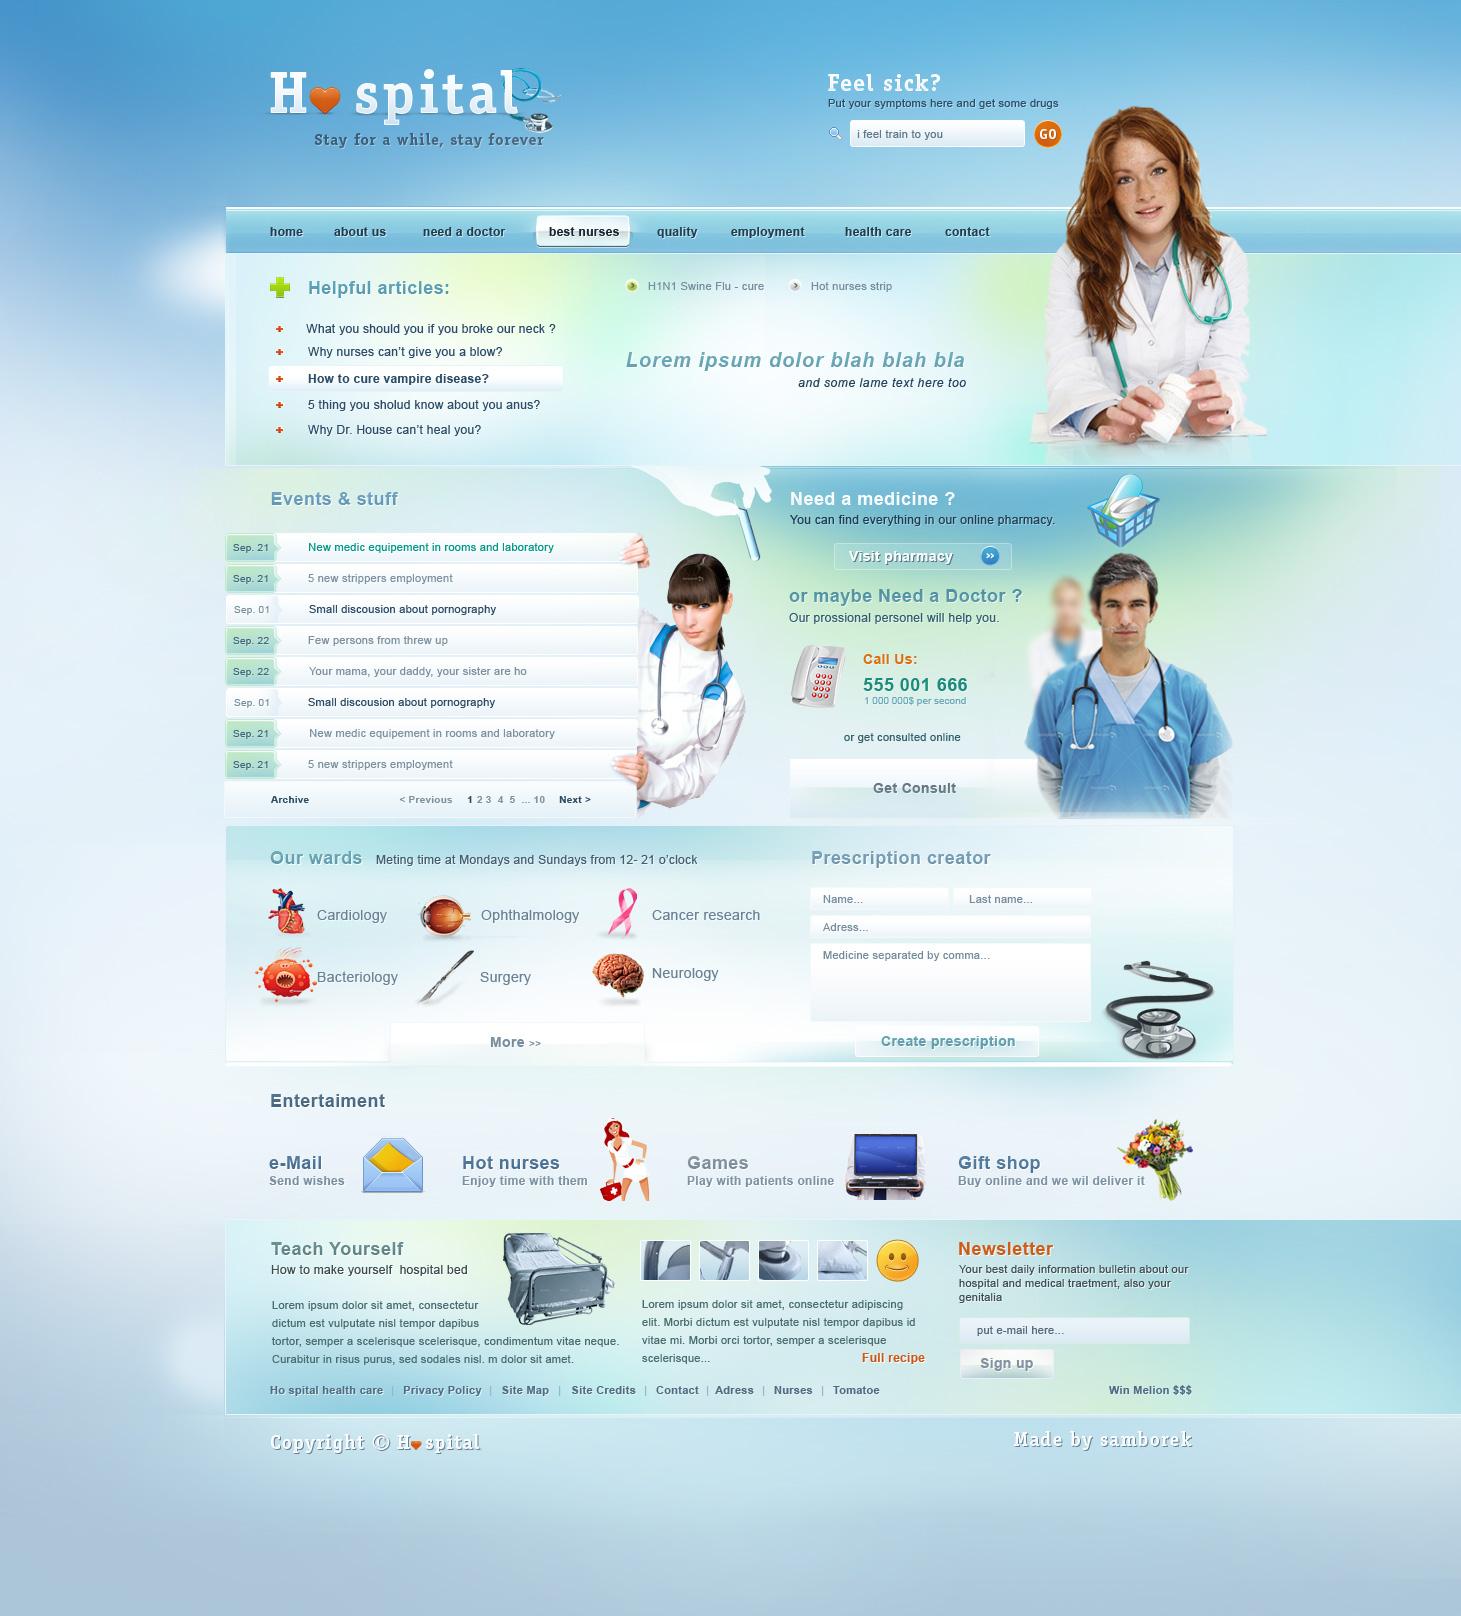 Ho spital design